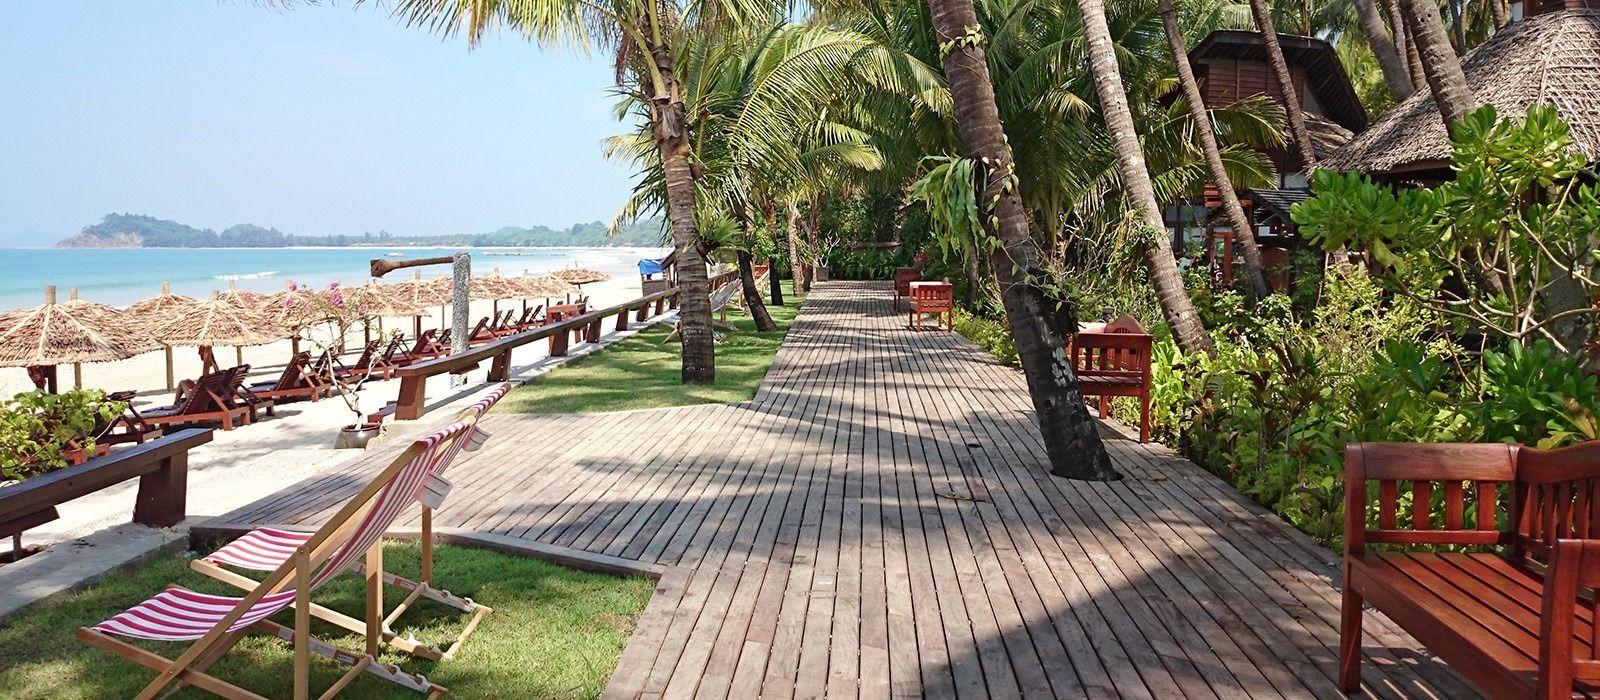 Myanmar: Beaches to Golden Rock Tour Trip 2